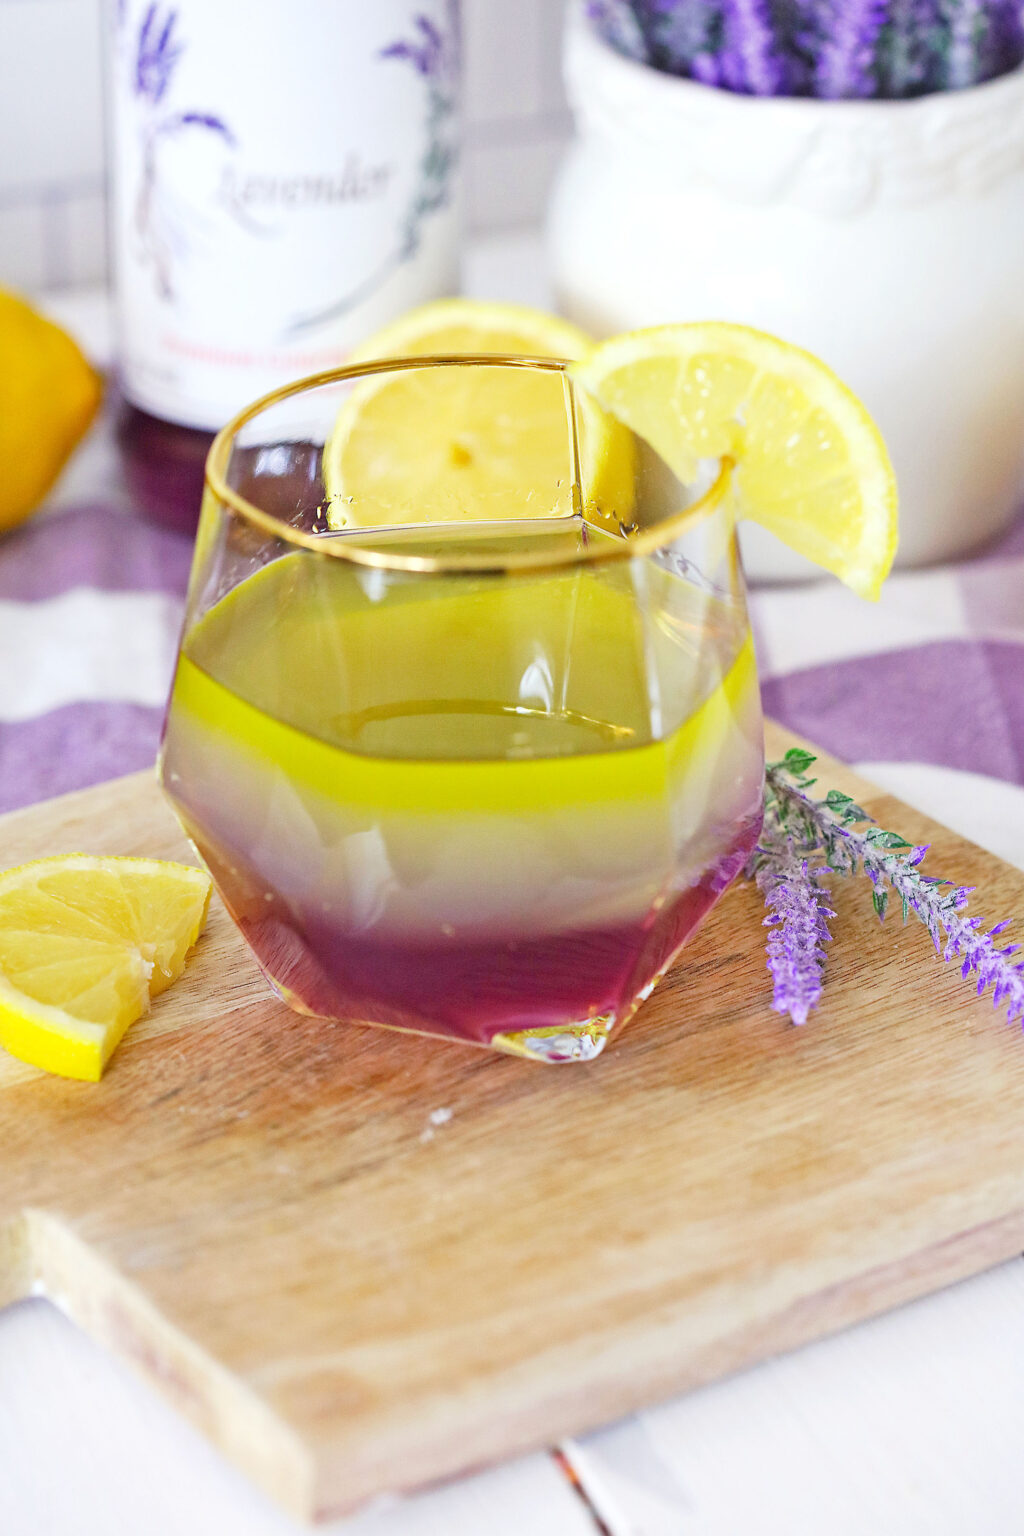 lavender lemon cocktail in a glass